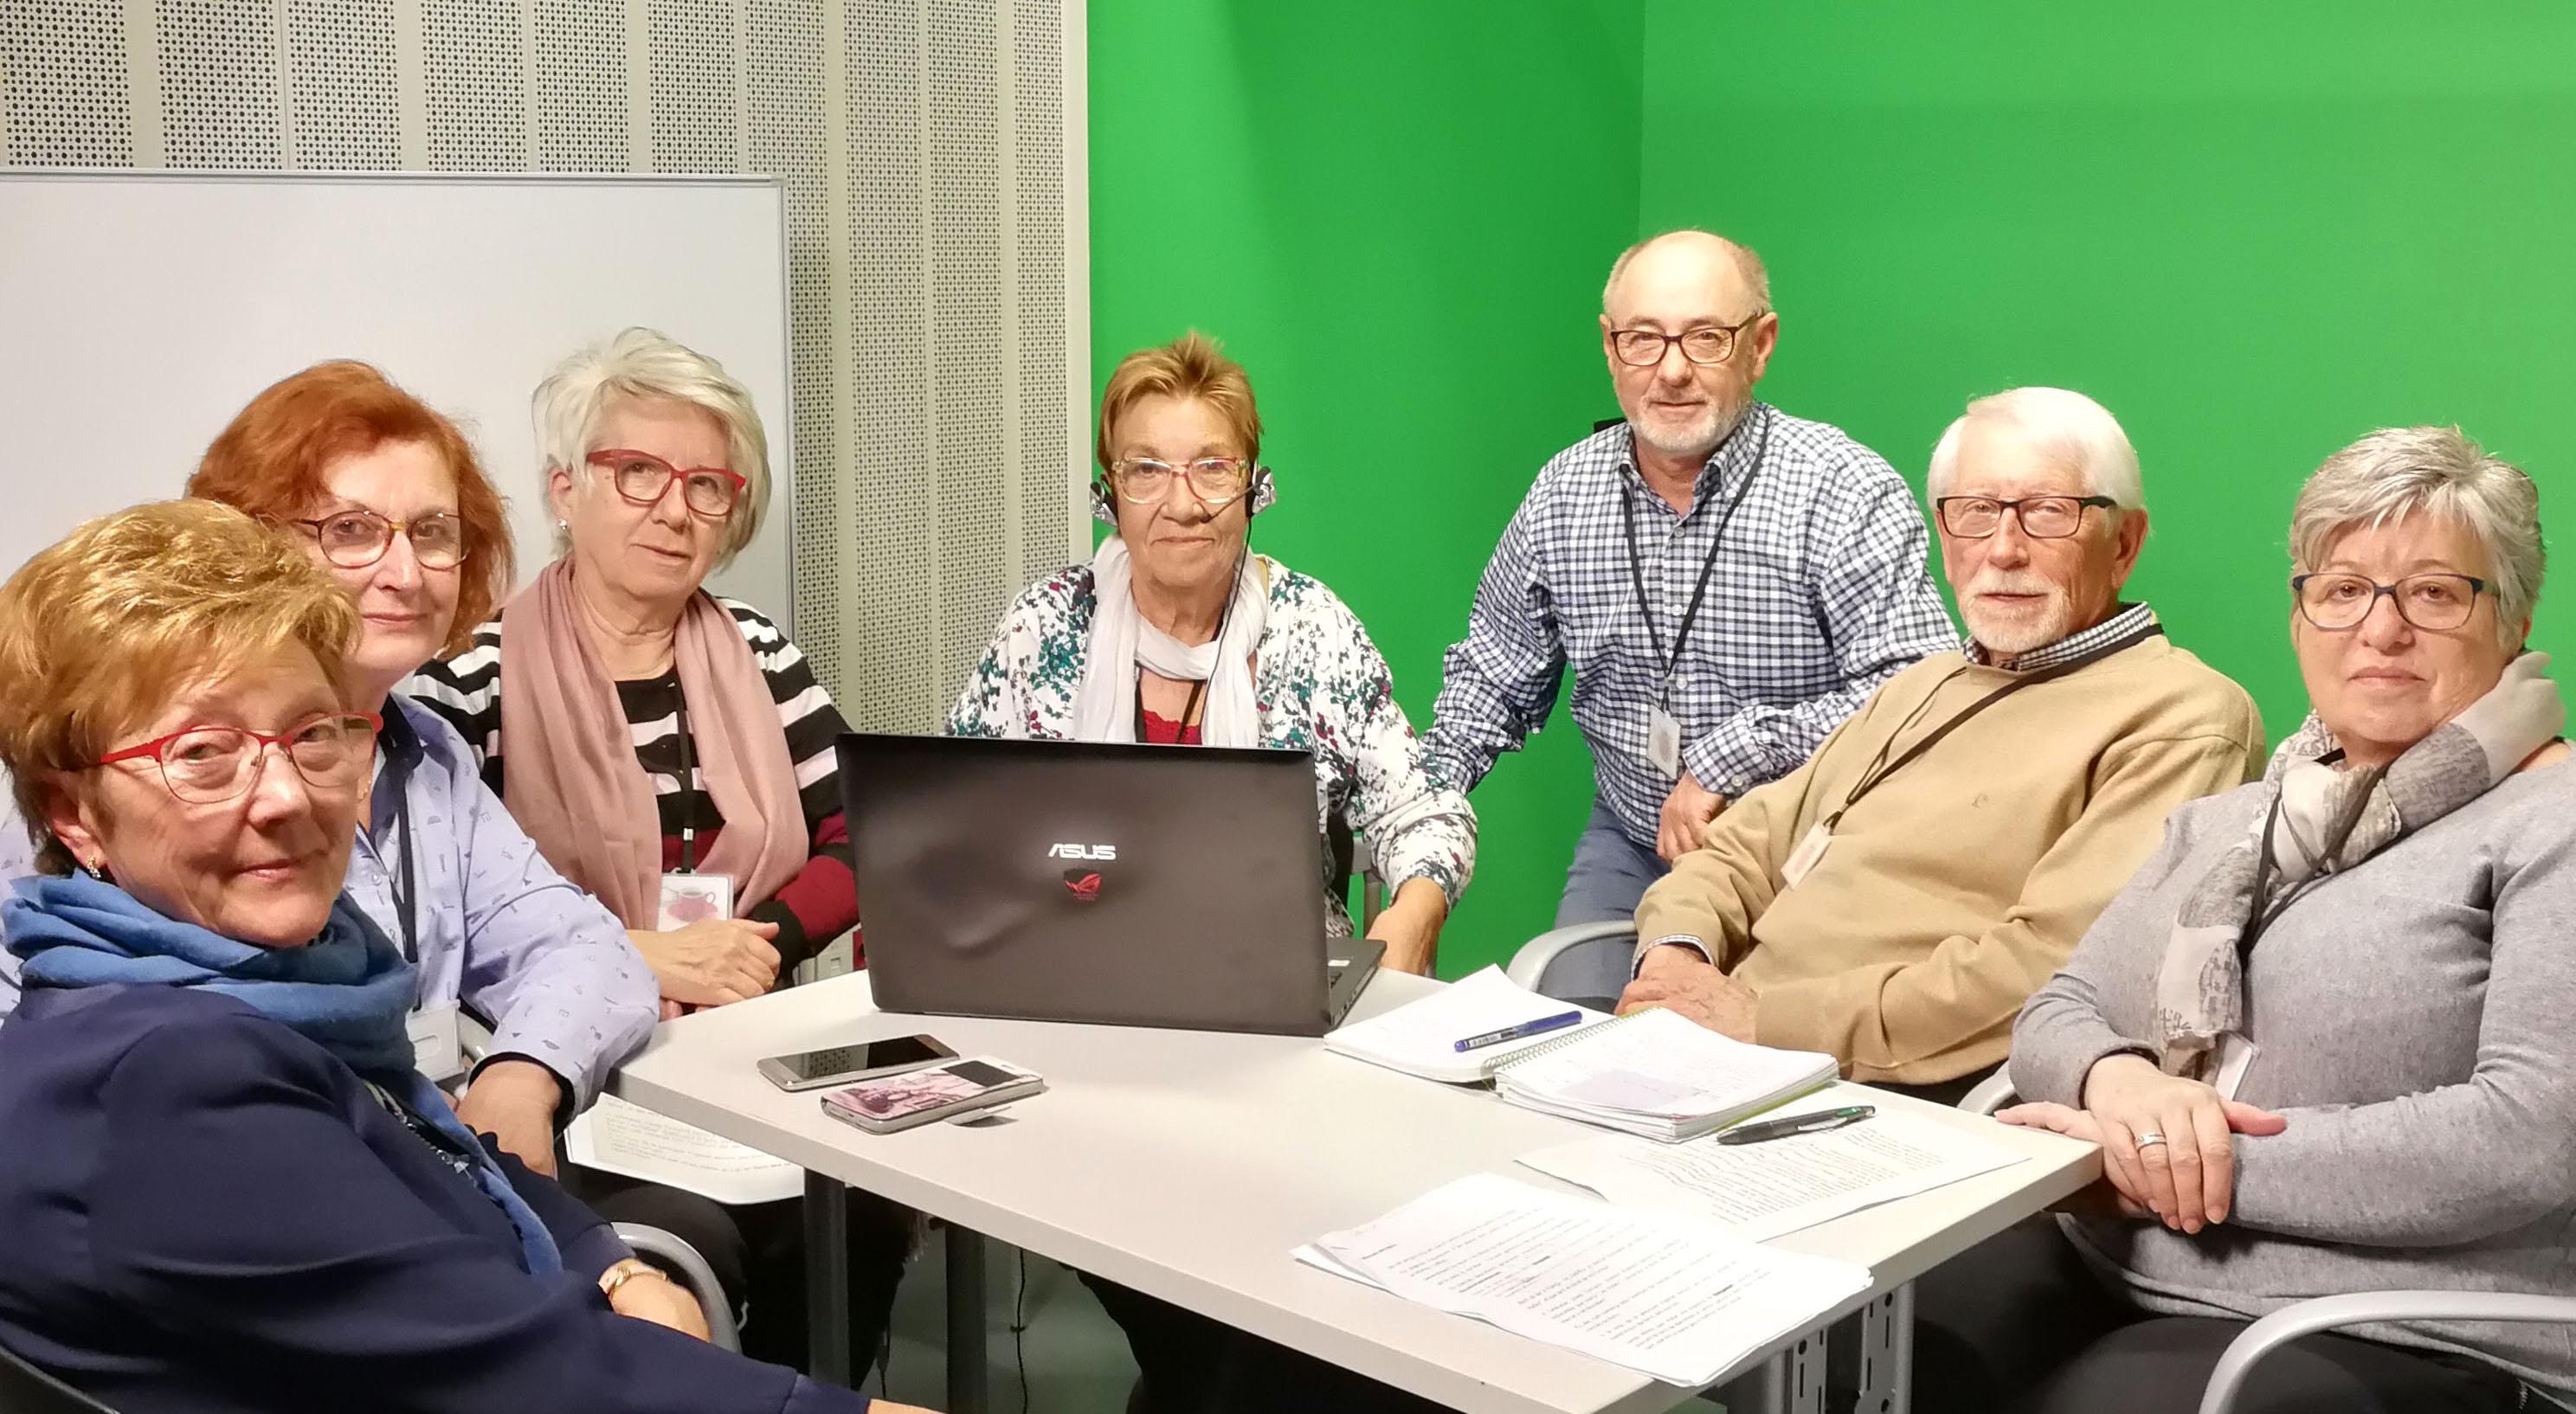 Projecte 'Sis Avis A La Cuina +1' - SeniorLab 2019